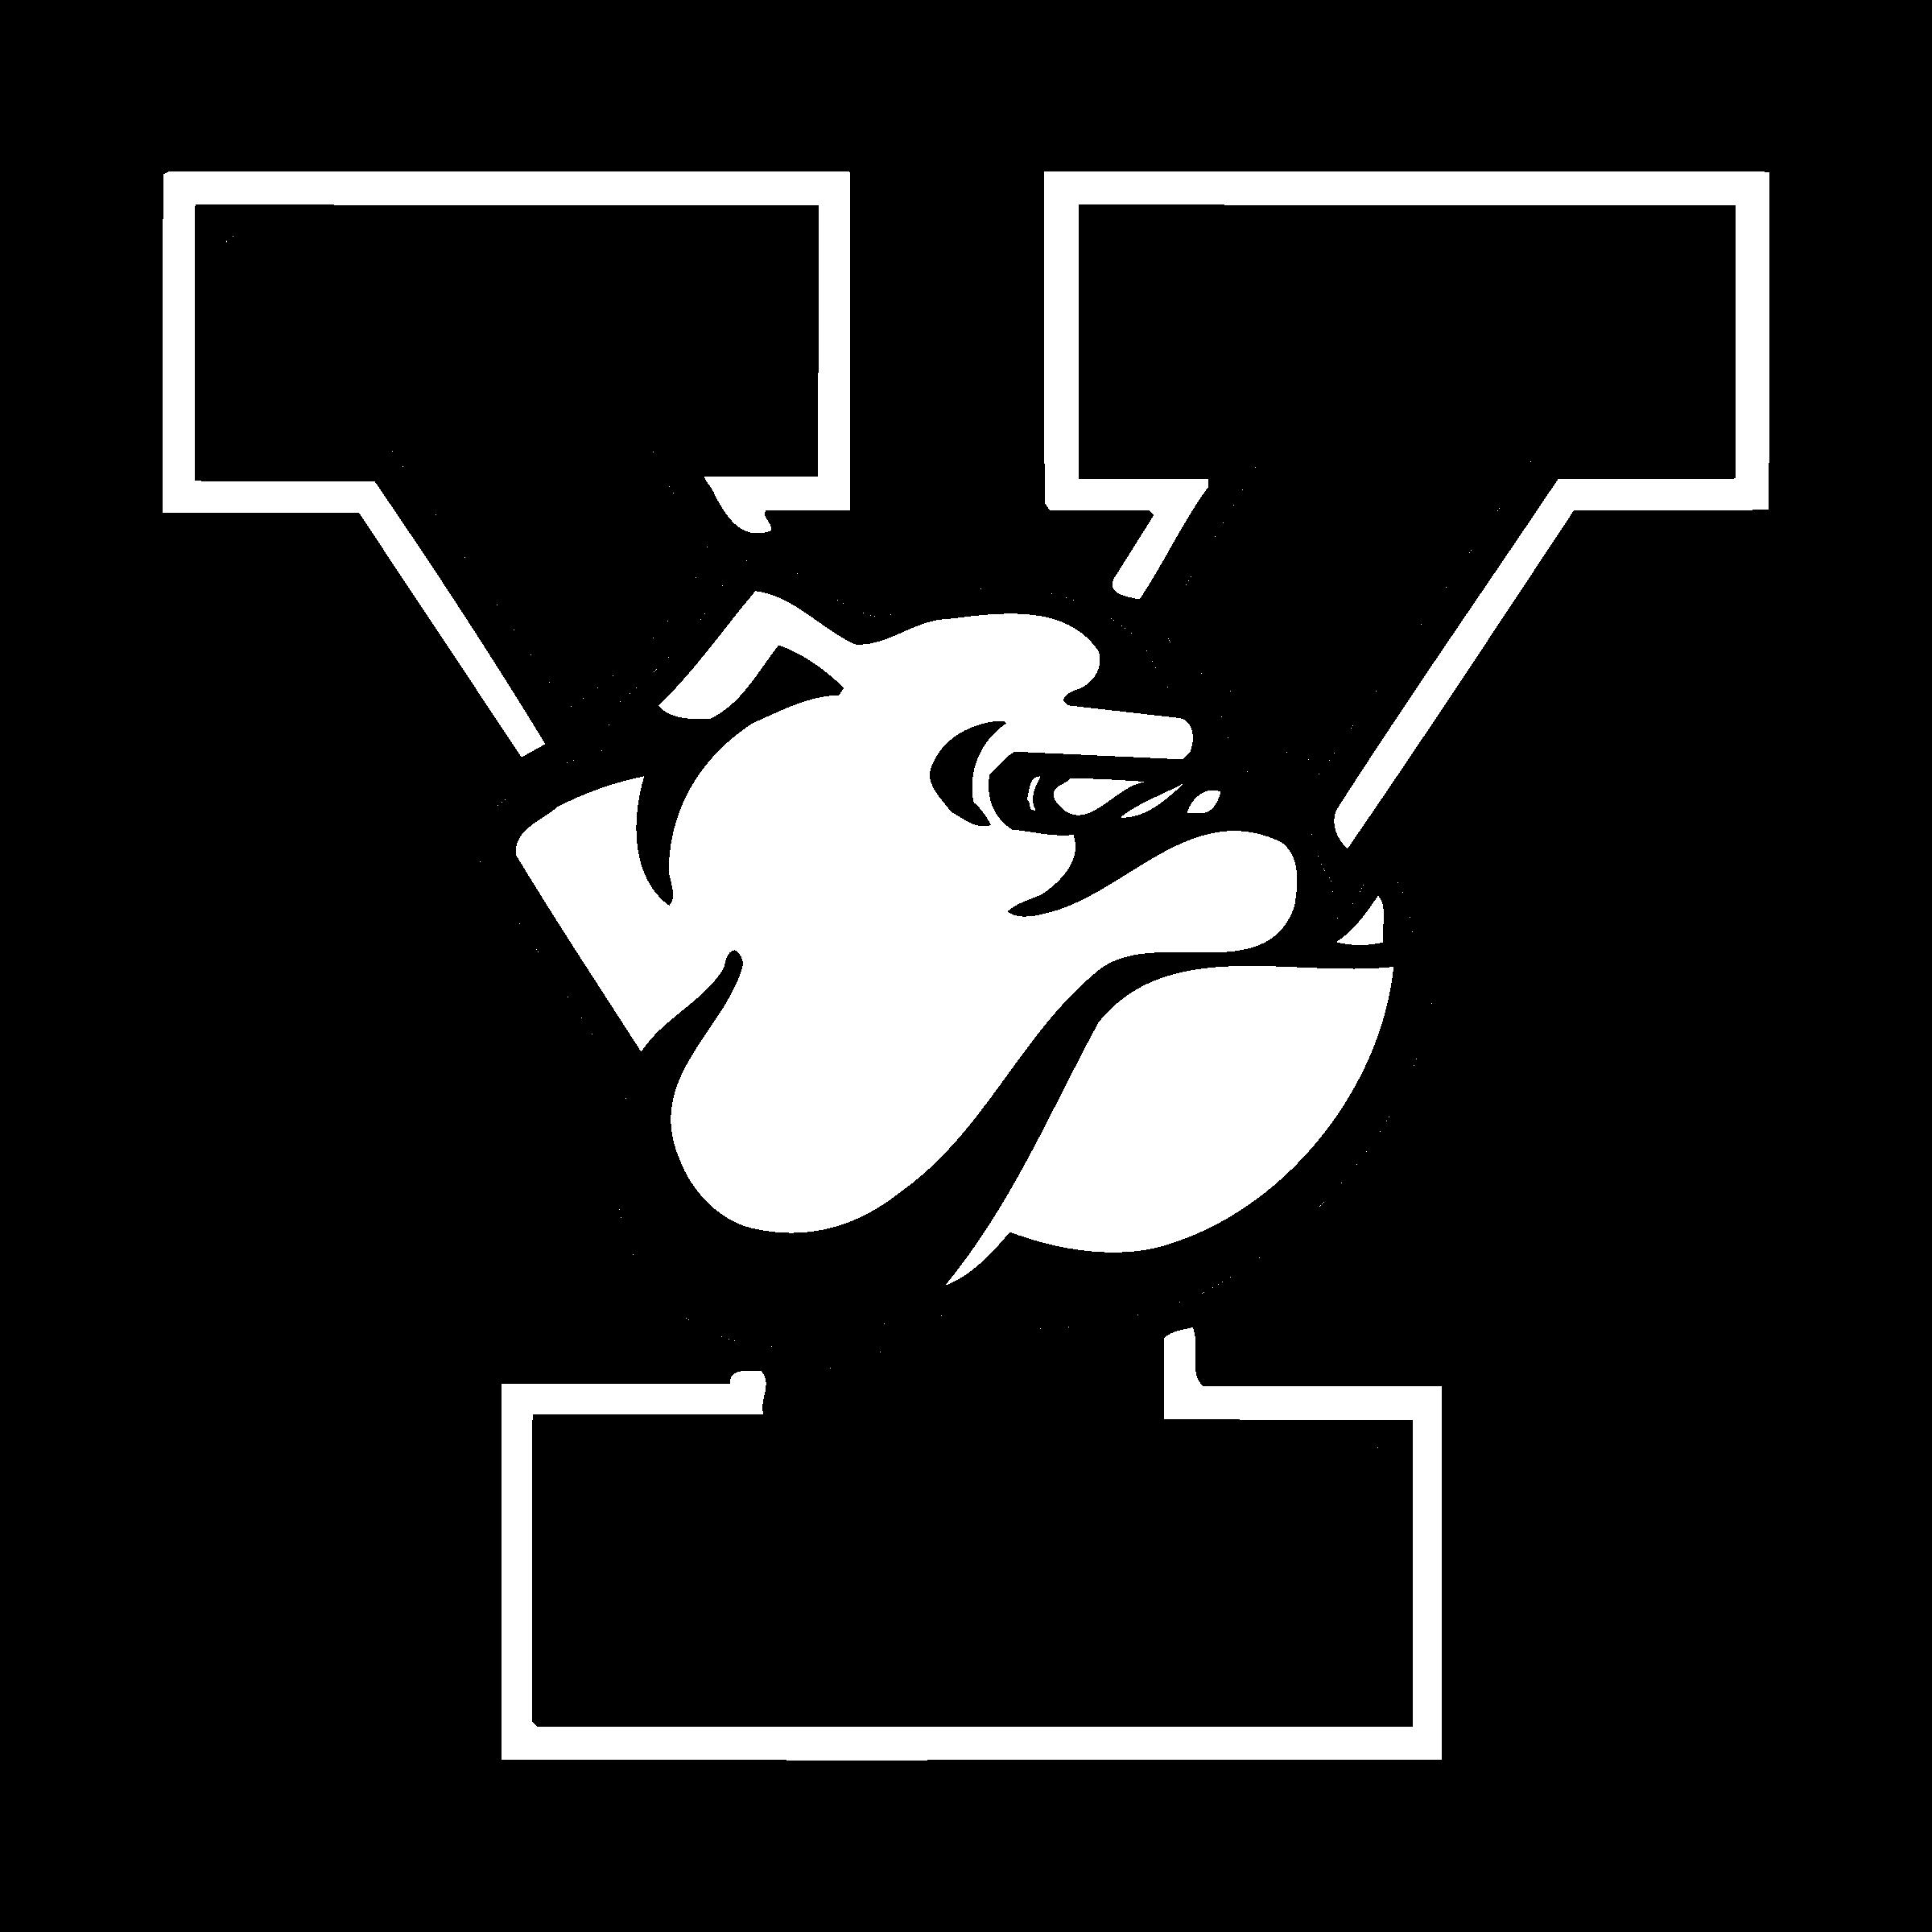 bulldog-clipart-yale-2.png